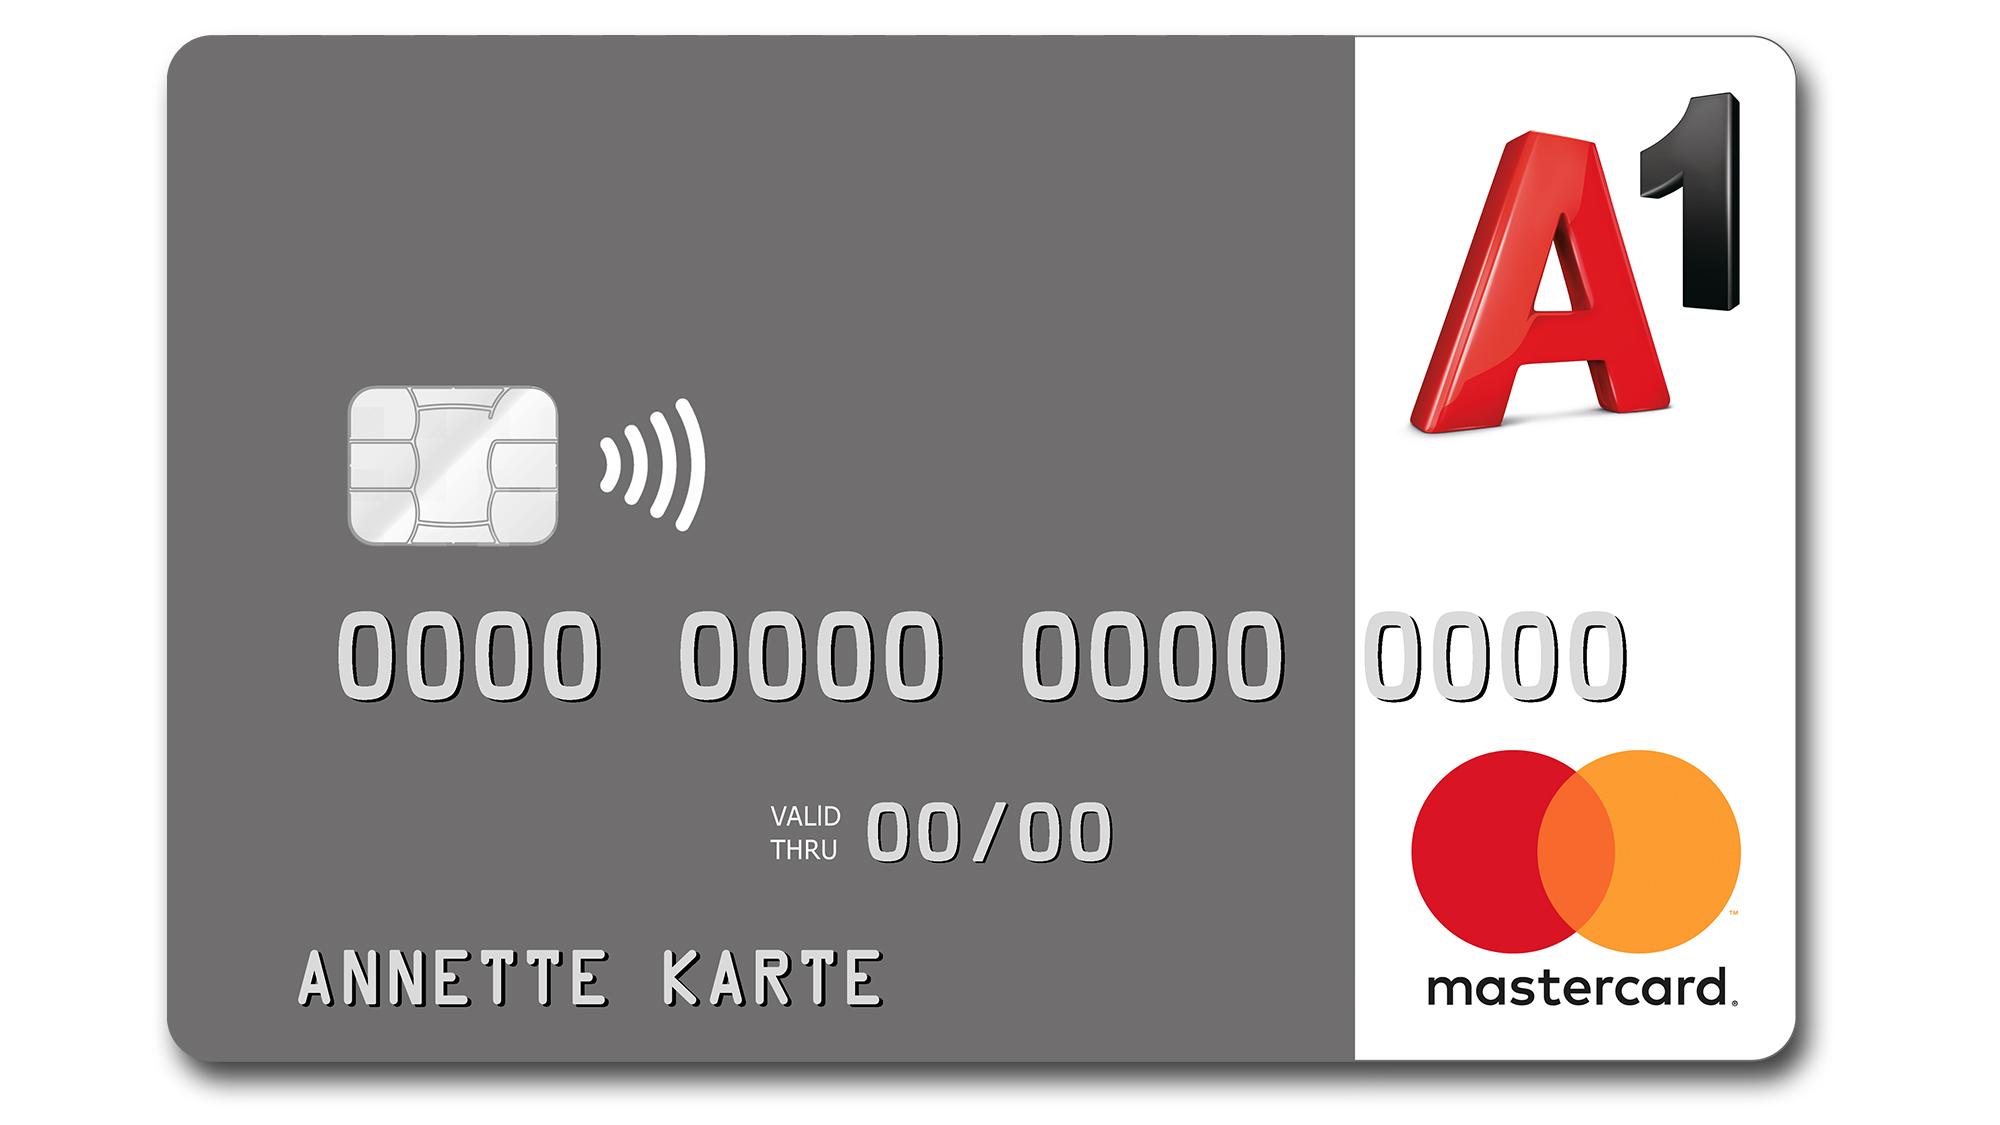 kreditkarten a1 kooperiert jetzt mit mastercard anstatt. Black Bedroom Furniture Sets. Home Design Ideas